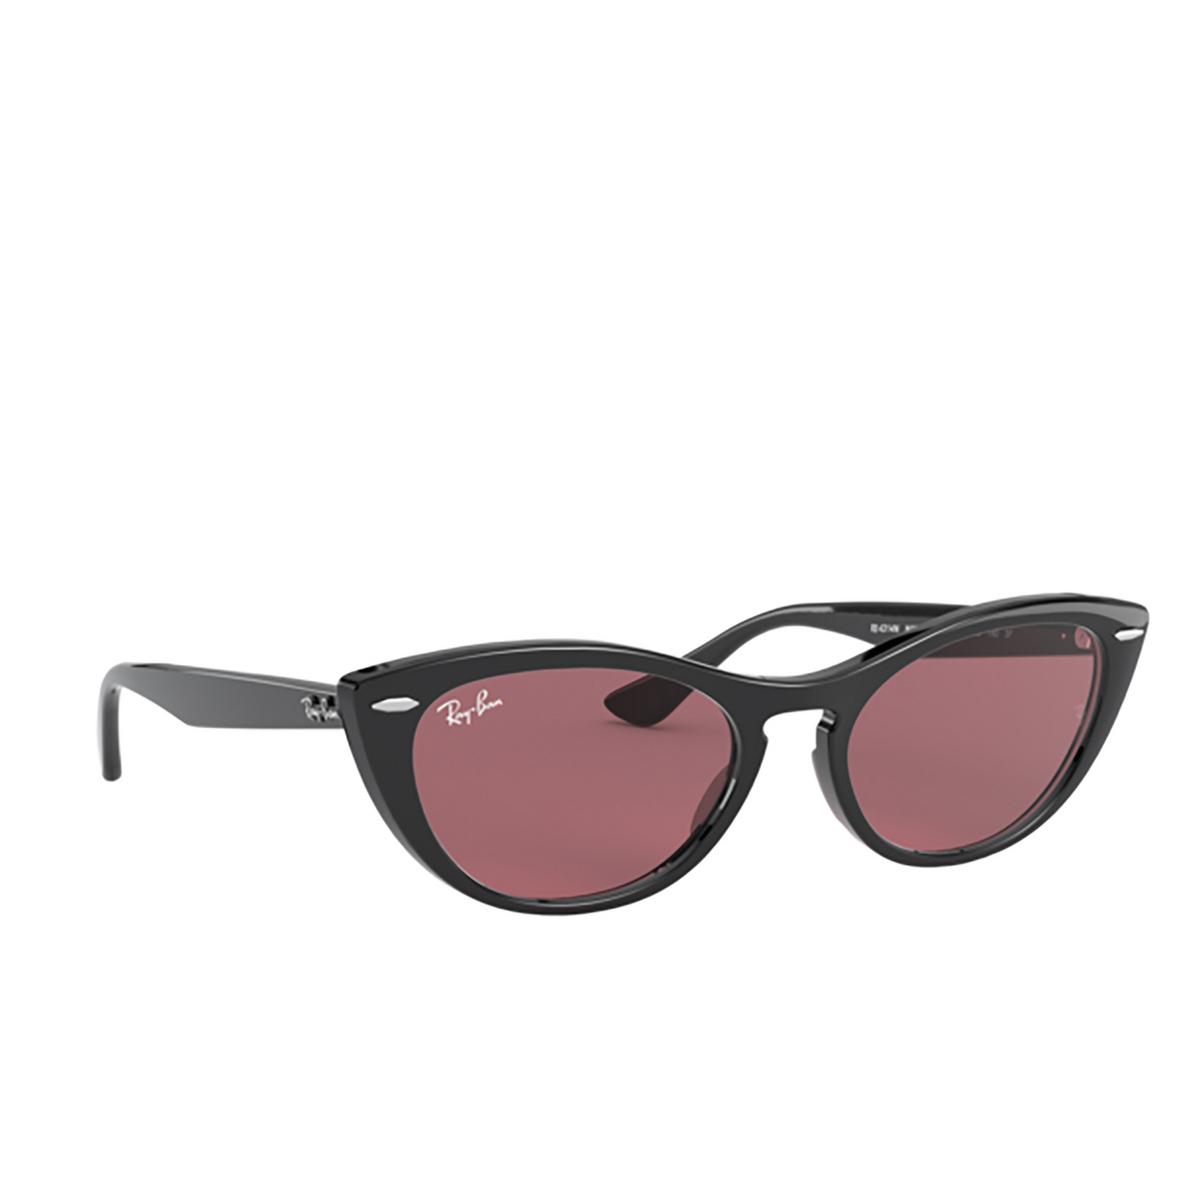 Ray-Ban® Cat-eye Sunglasses: Nina RB4314N color Black 601/U0 - 2/3.